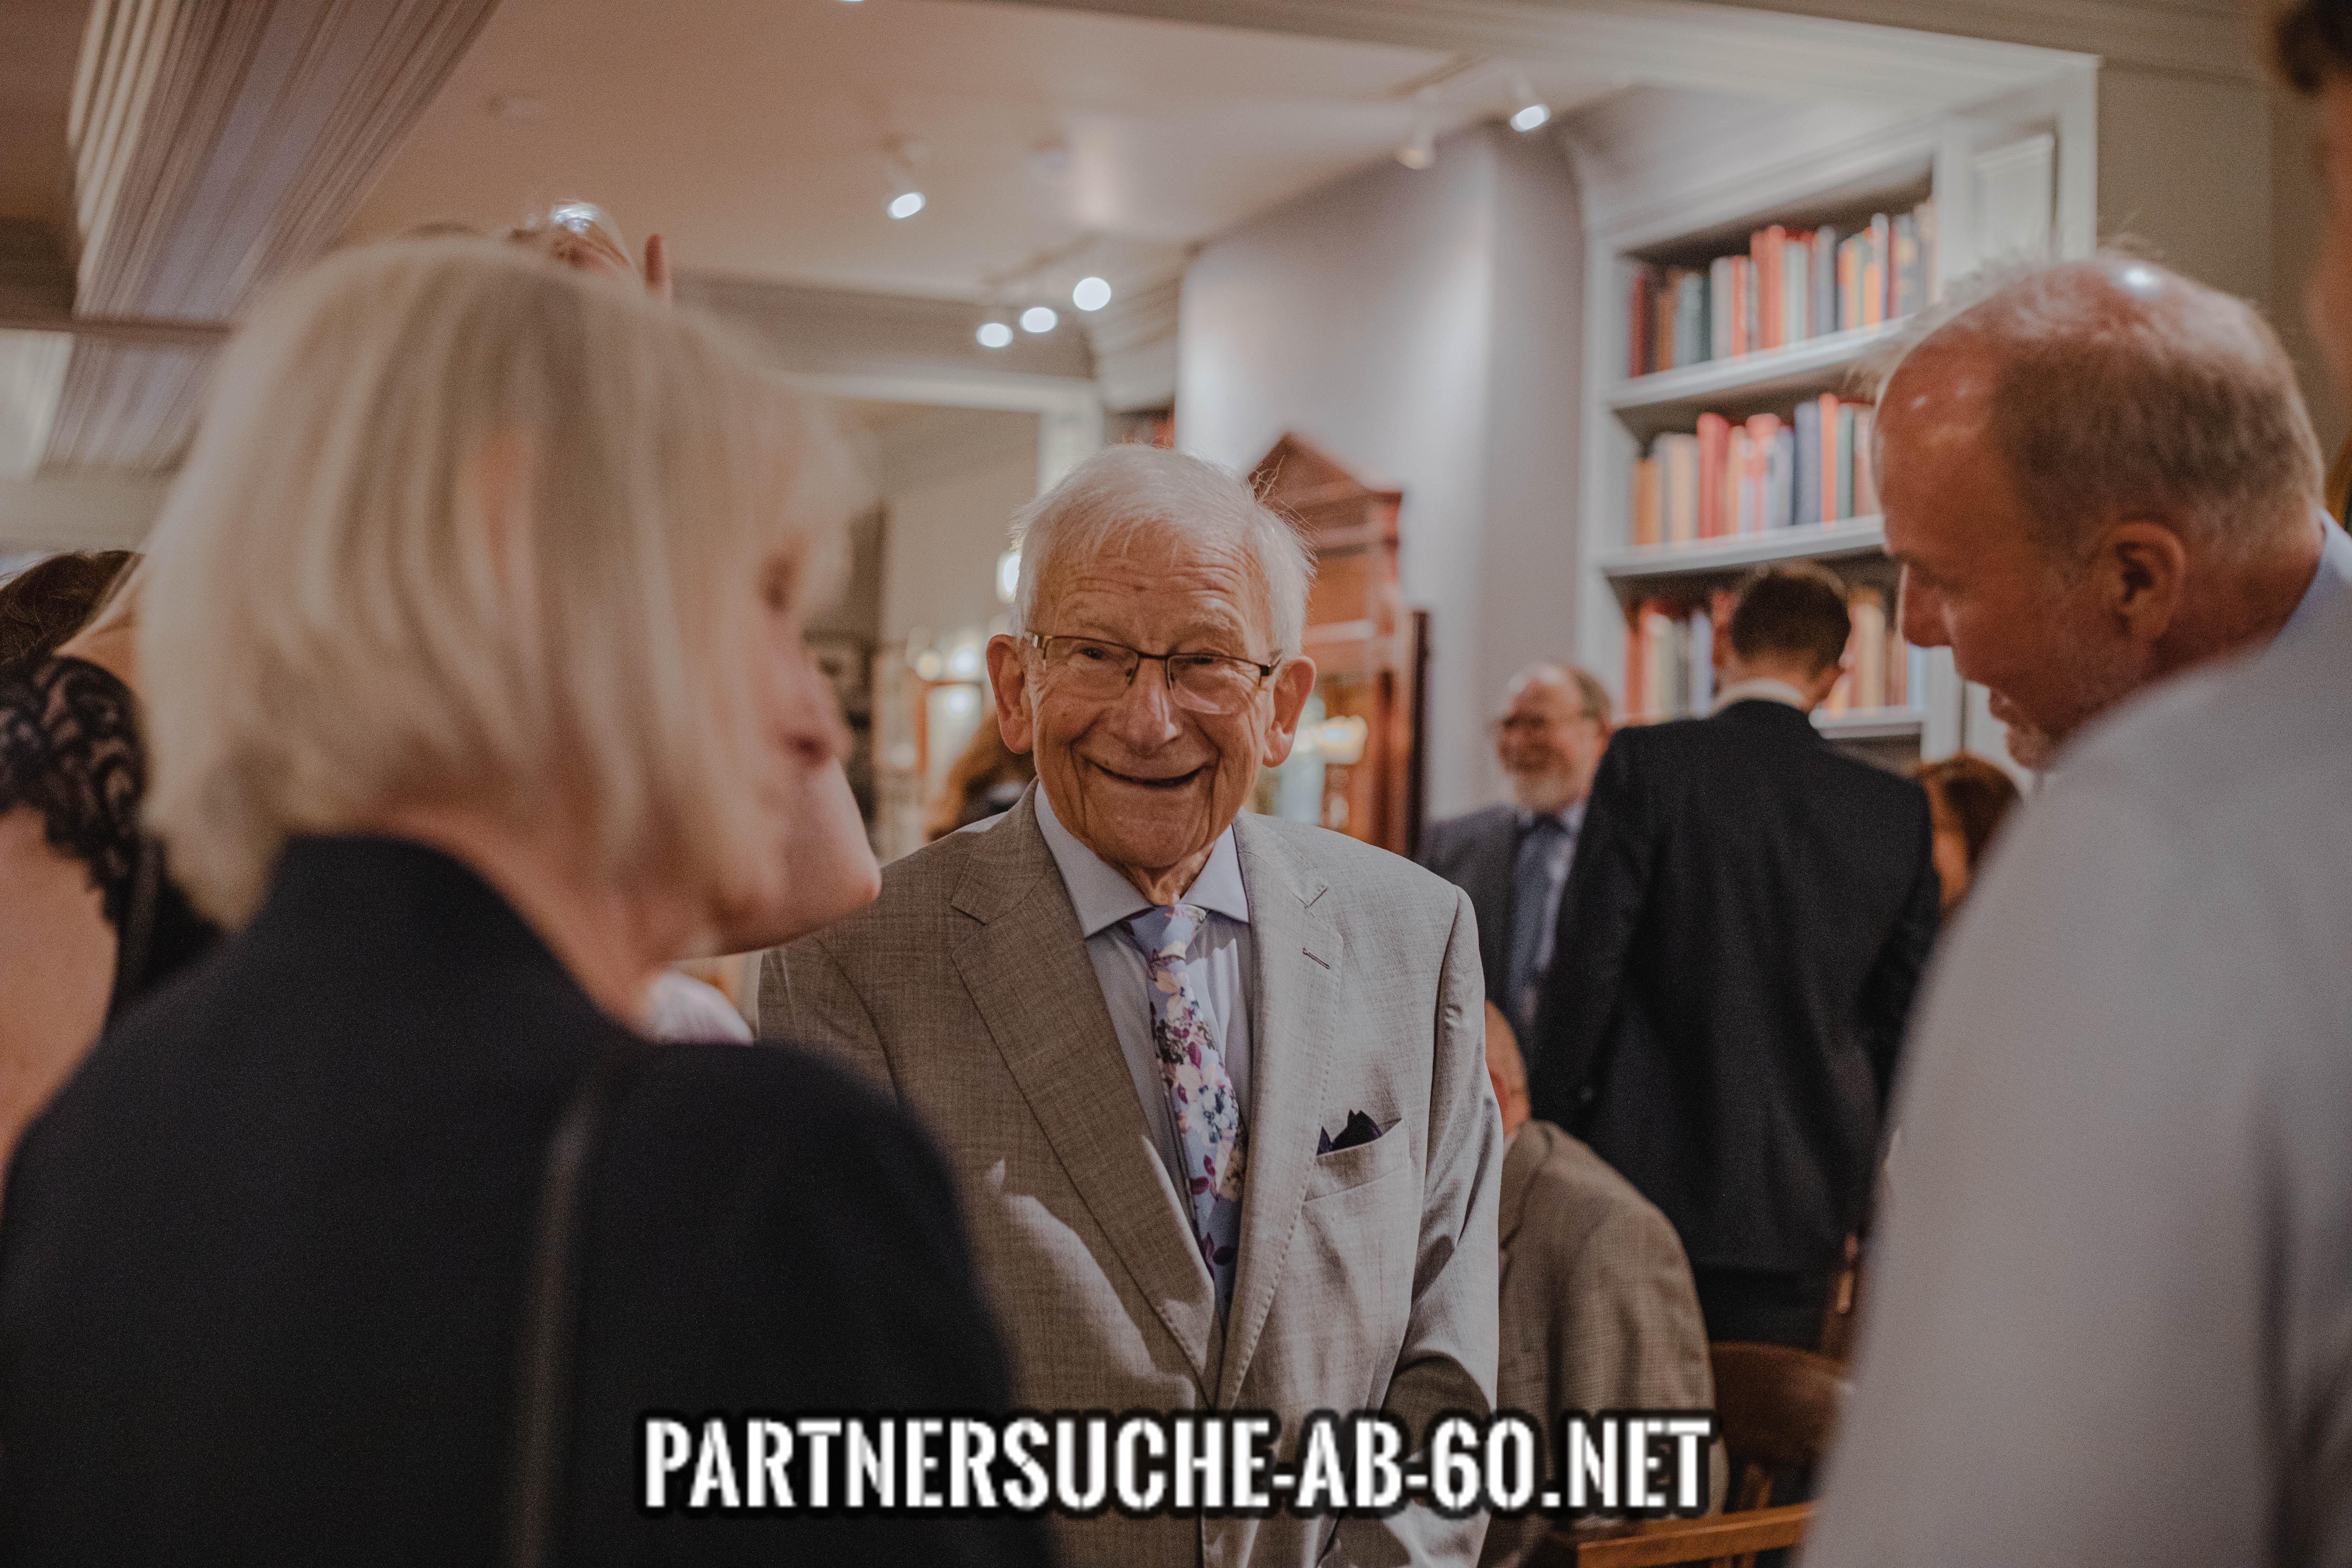 Partnersuche ab 60 heilbronn